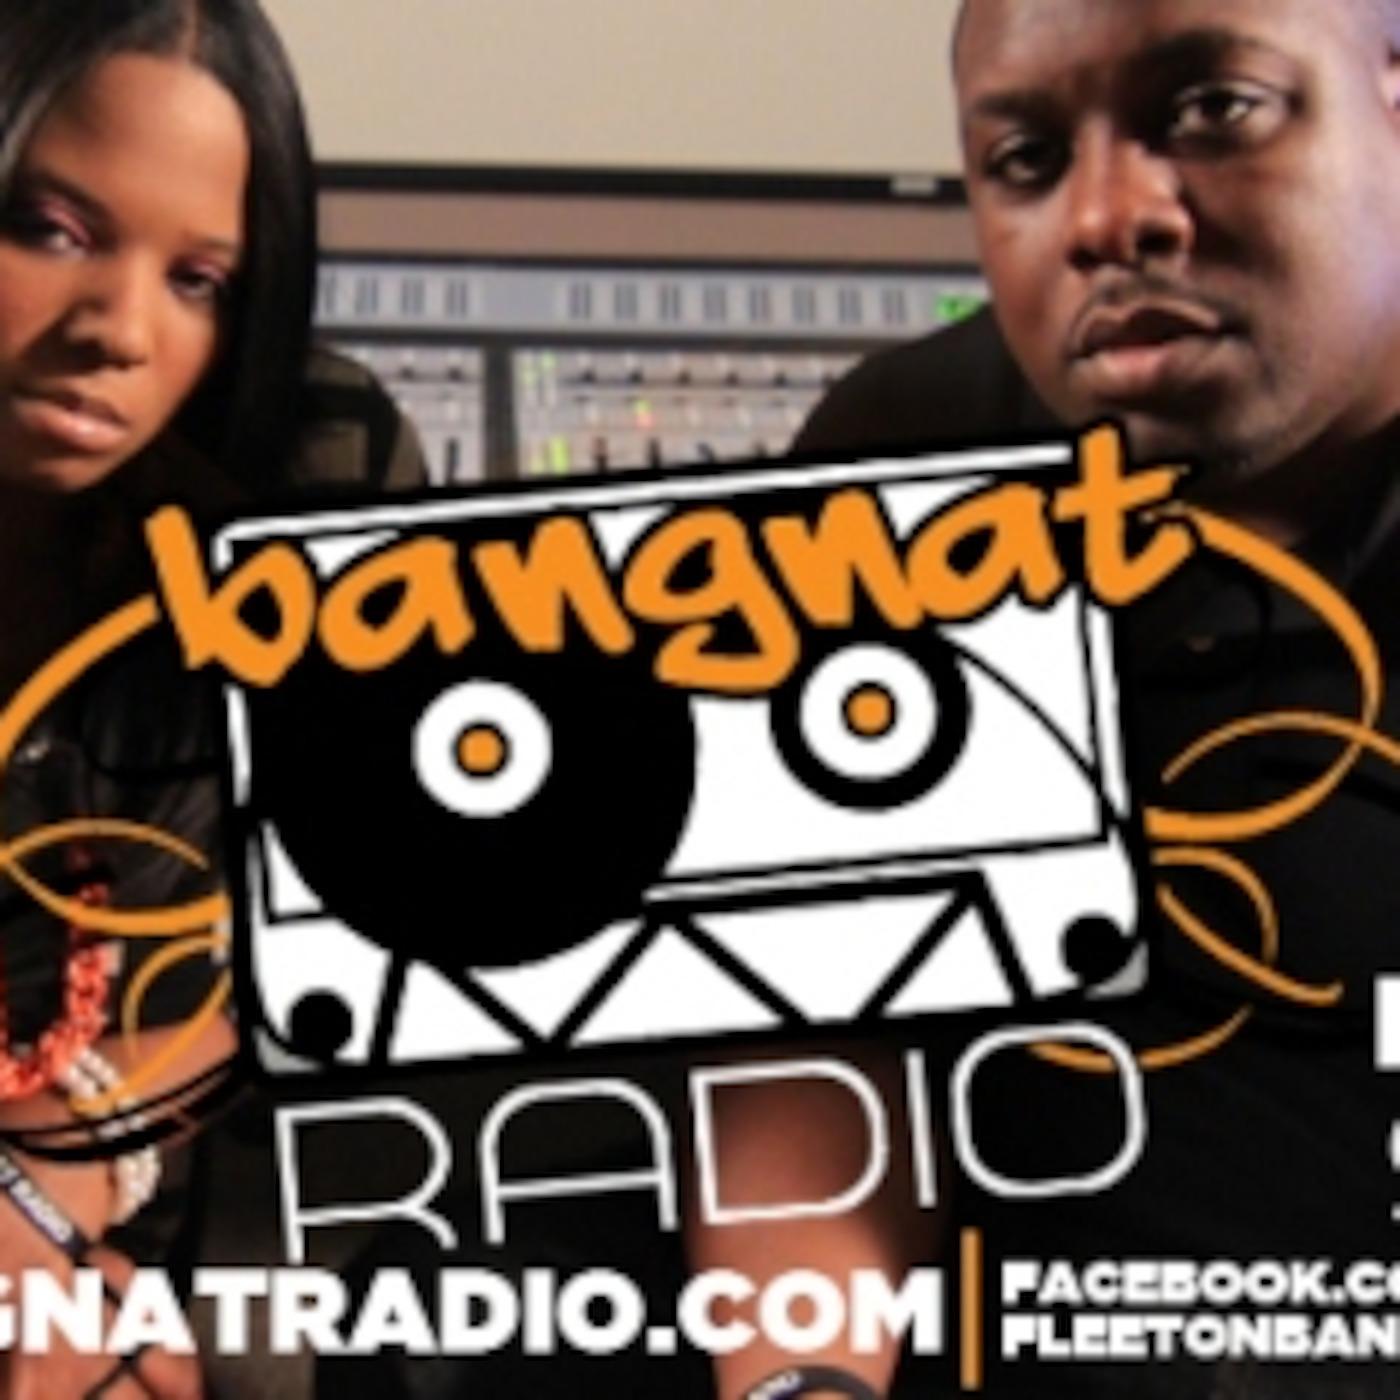 Bangnat Radio's Podcast